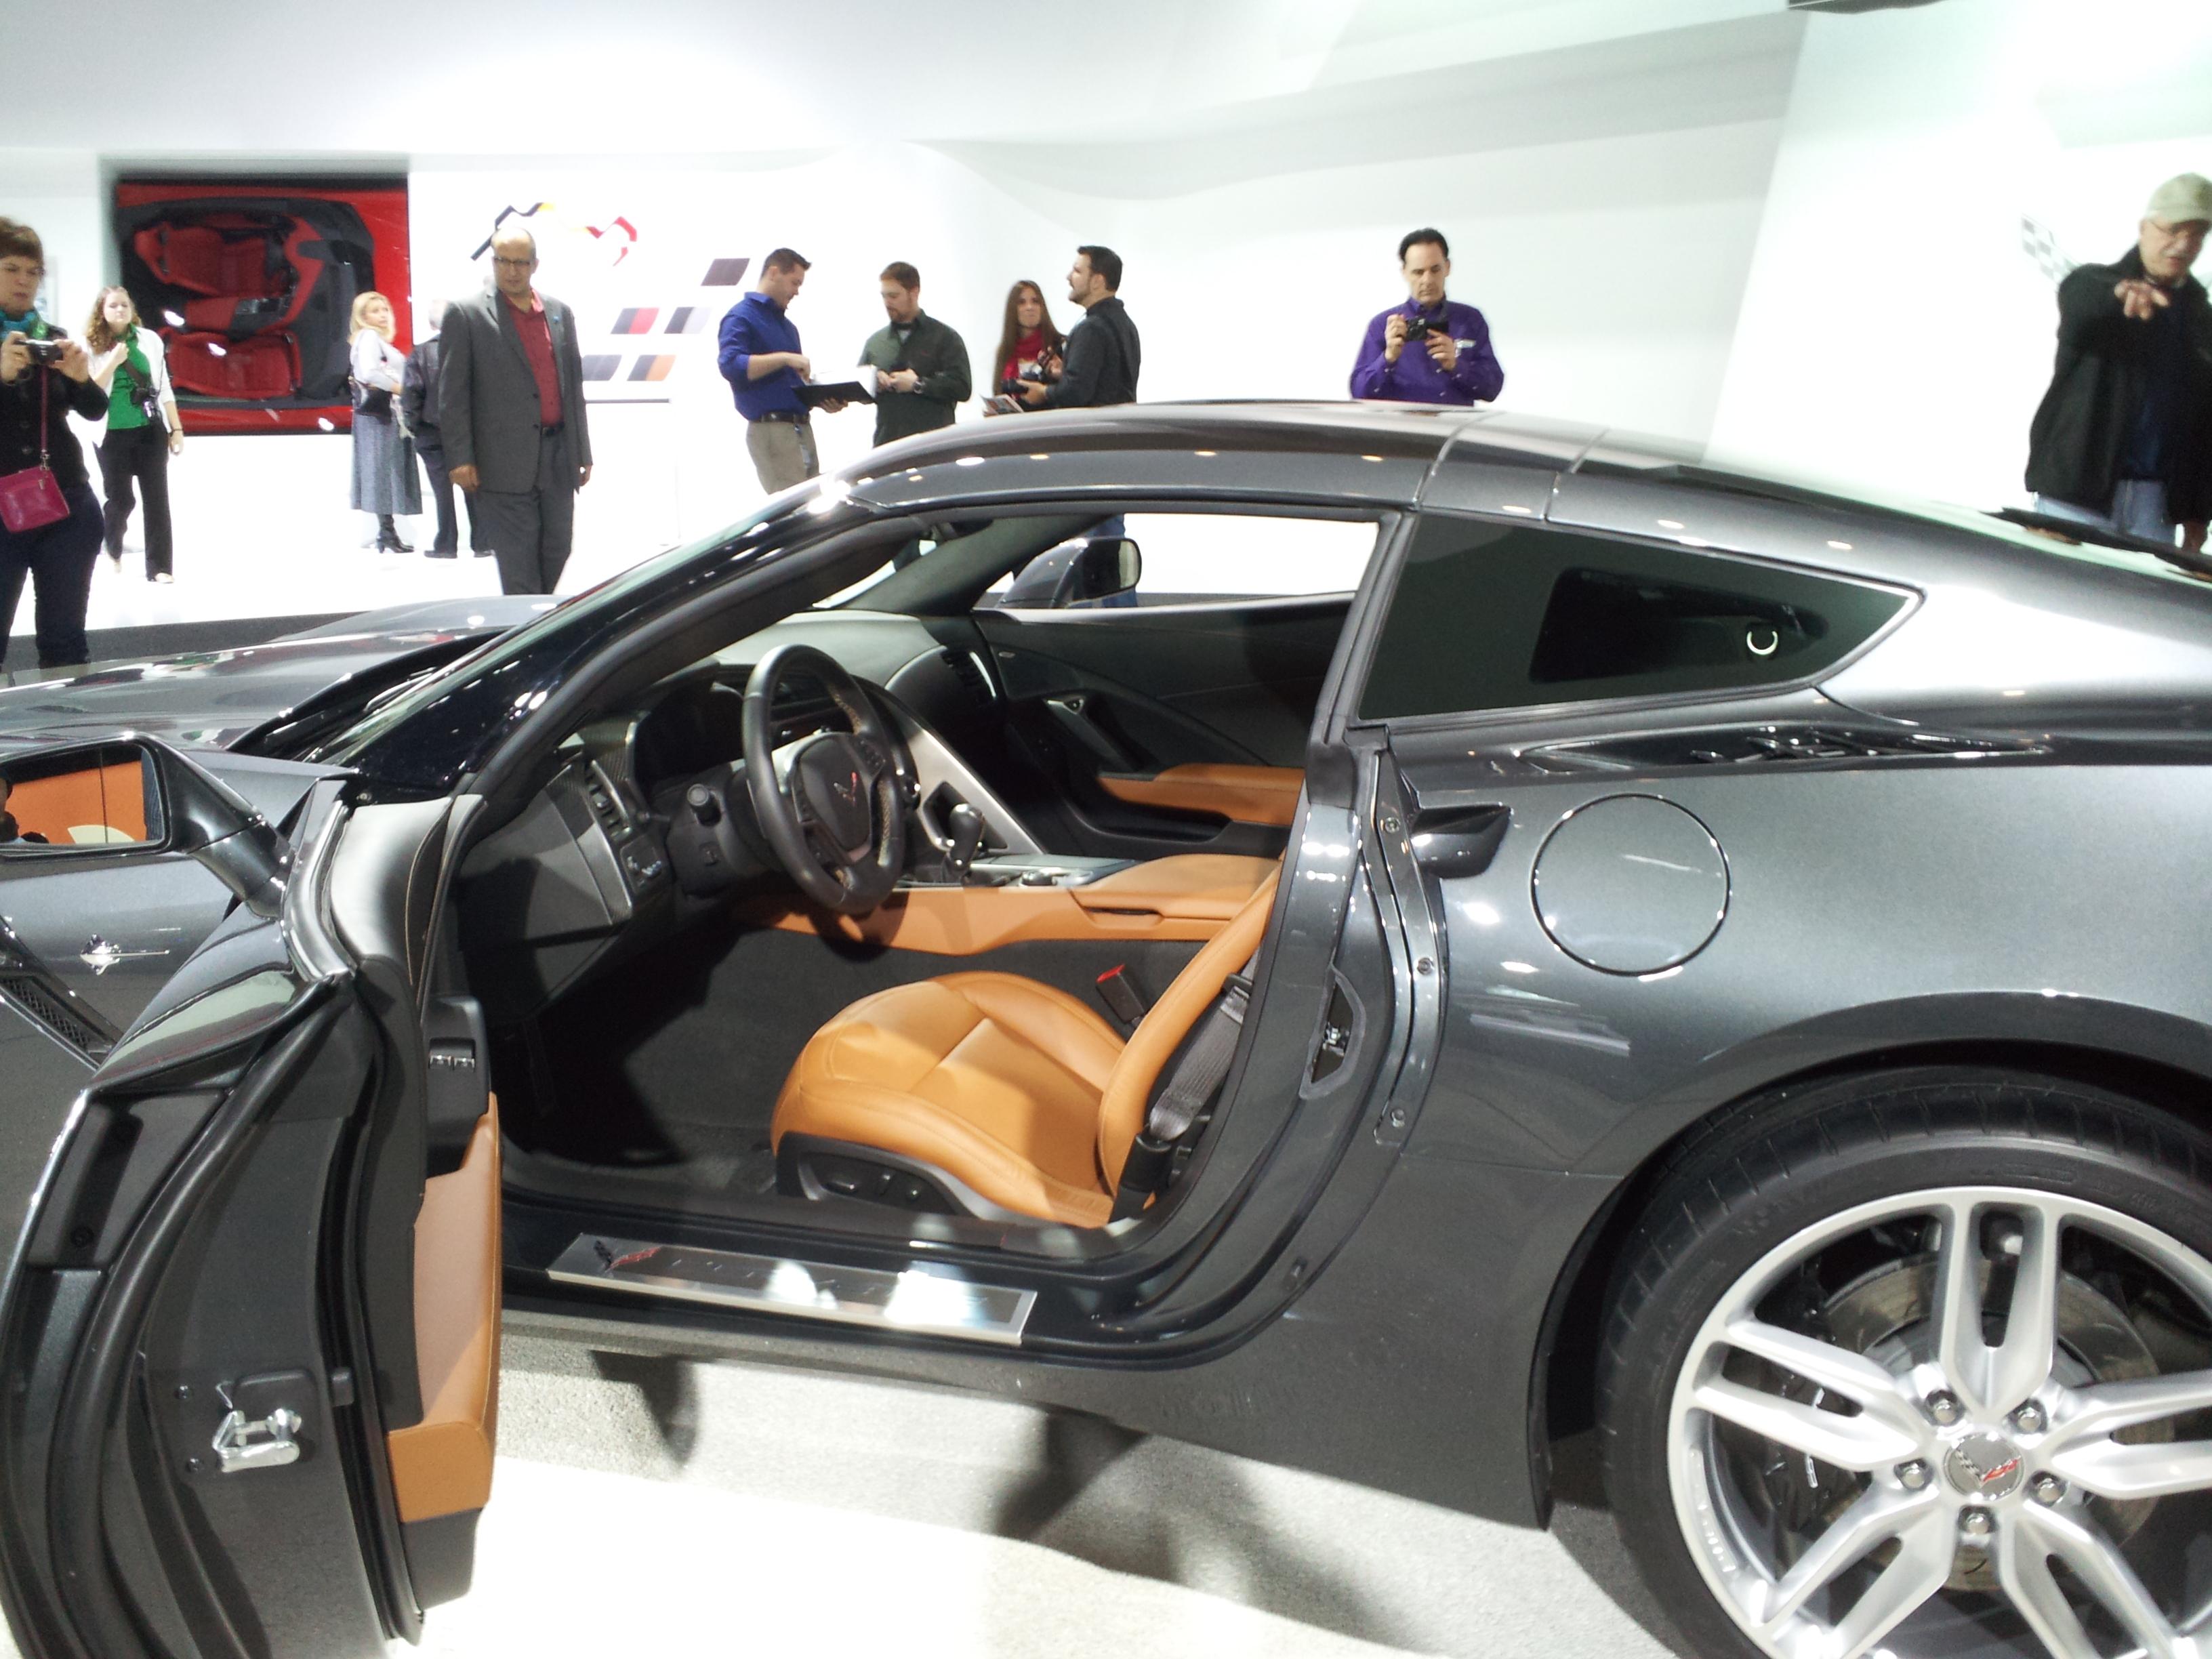 2014_Corvette_Kalahari_Interior_at_2013_Detroit_Auto_Show